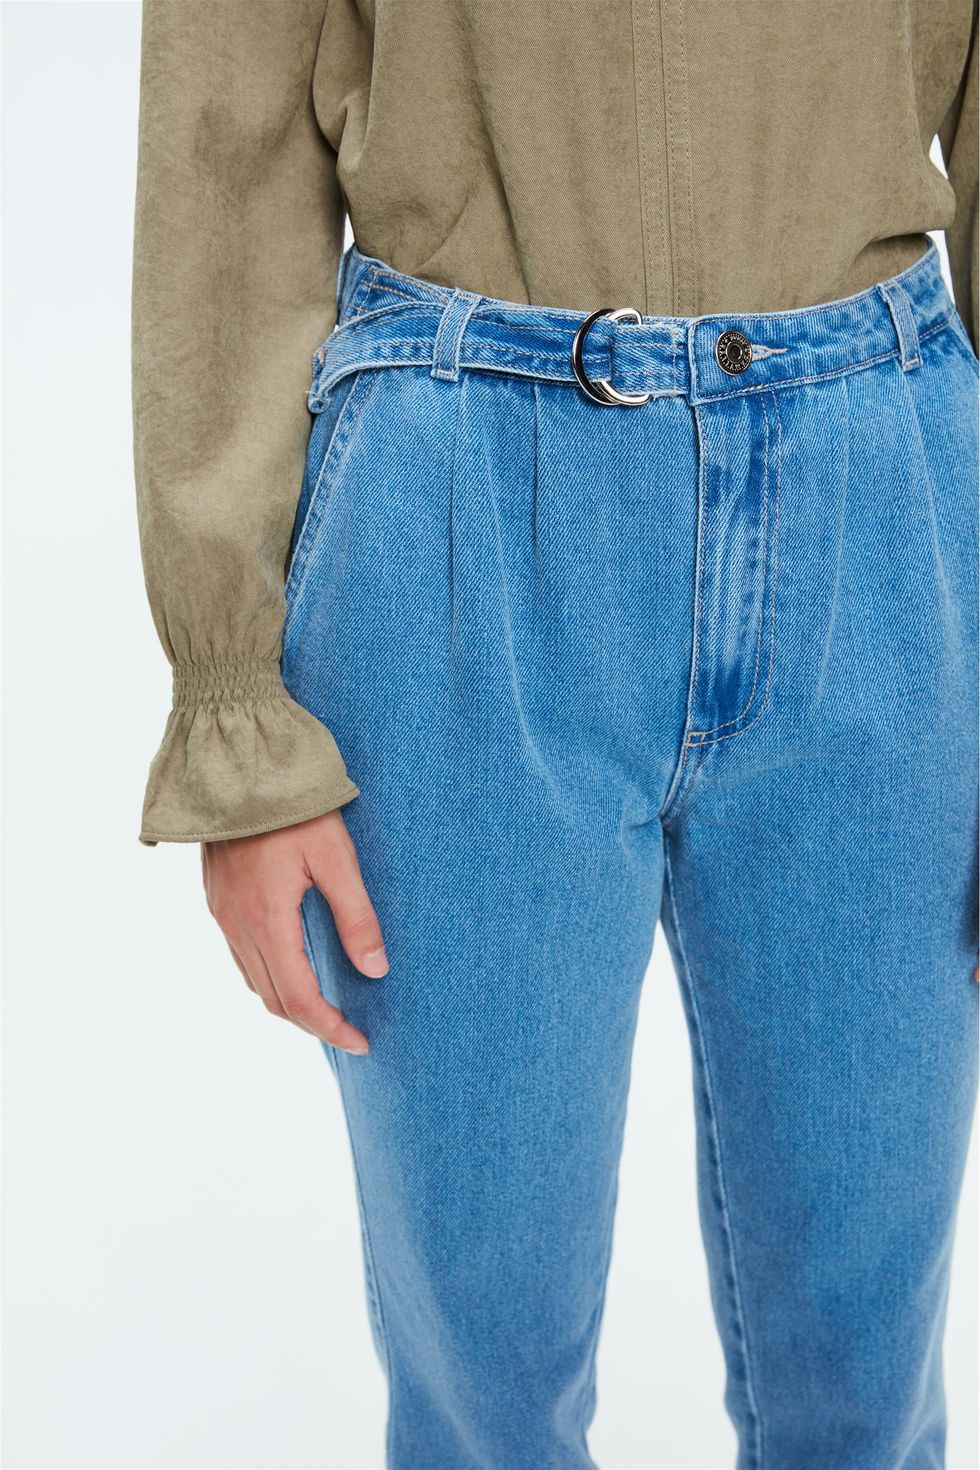 Calca-Jeans-Pleated-Feminina-Frente--